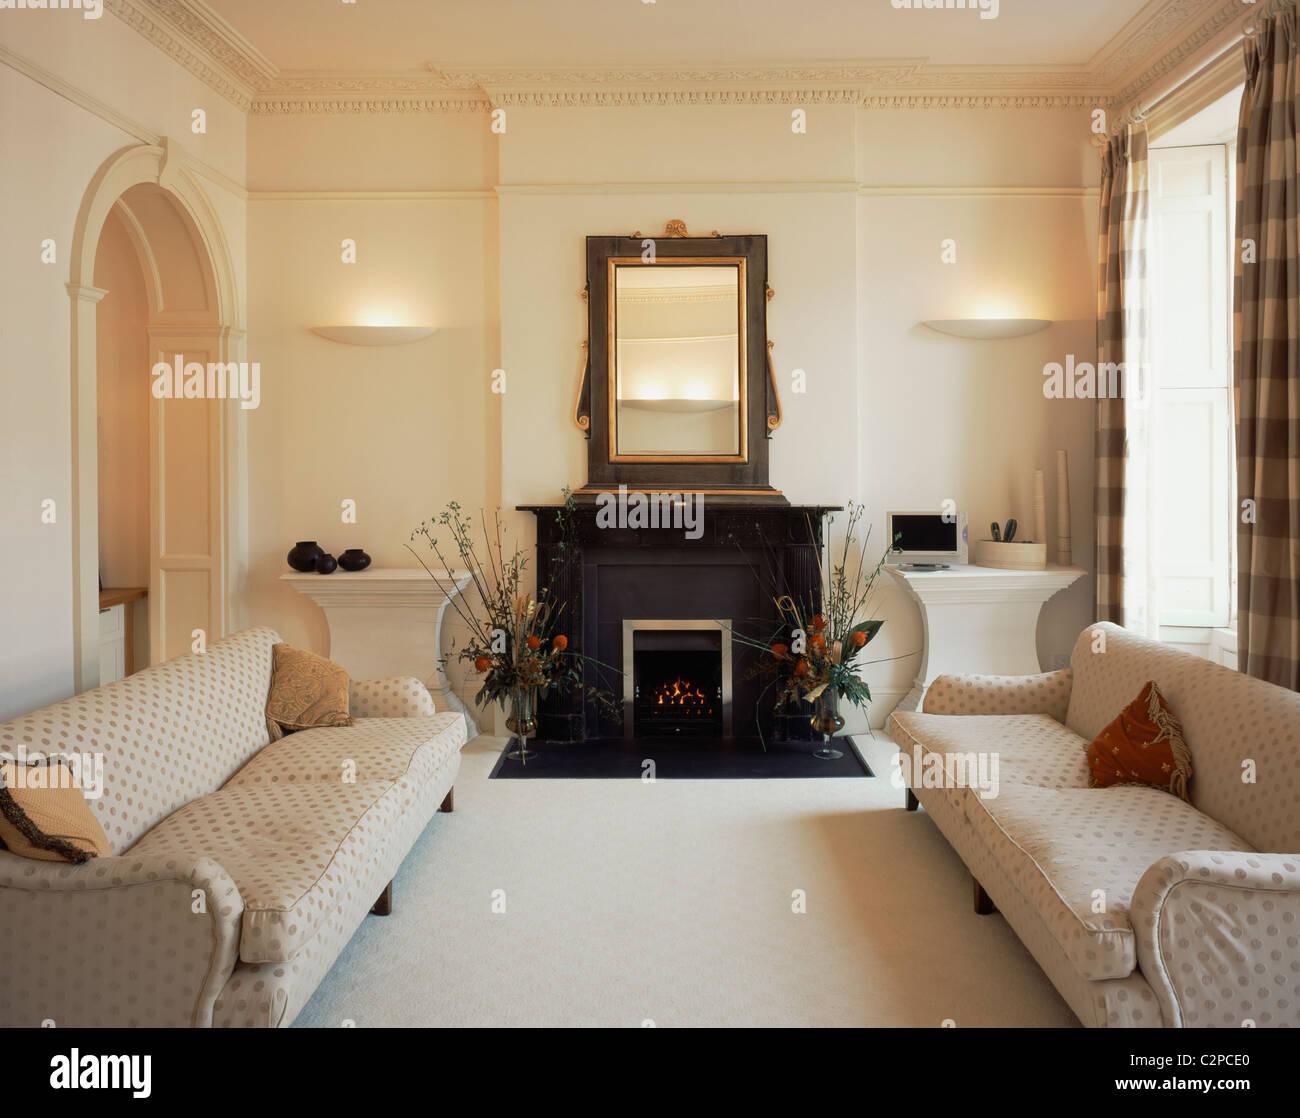 living room edinburgh on vaporbullfl com living room edinburgh on vaporbullfl com